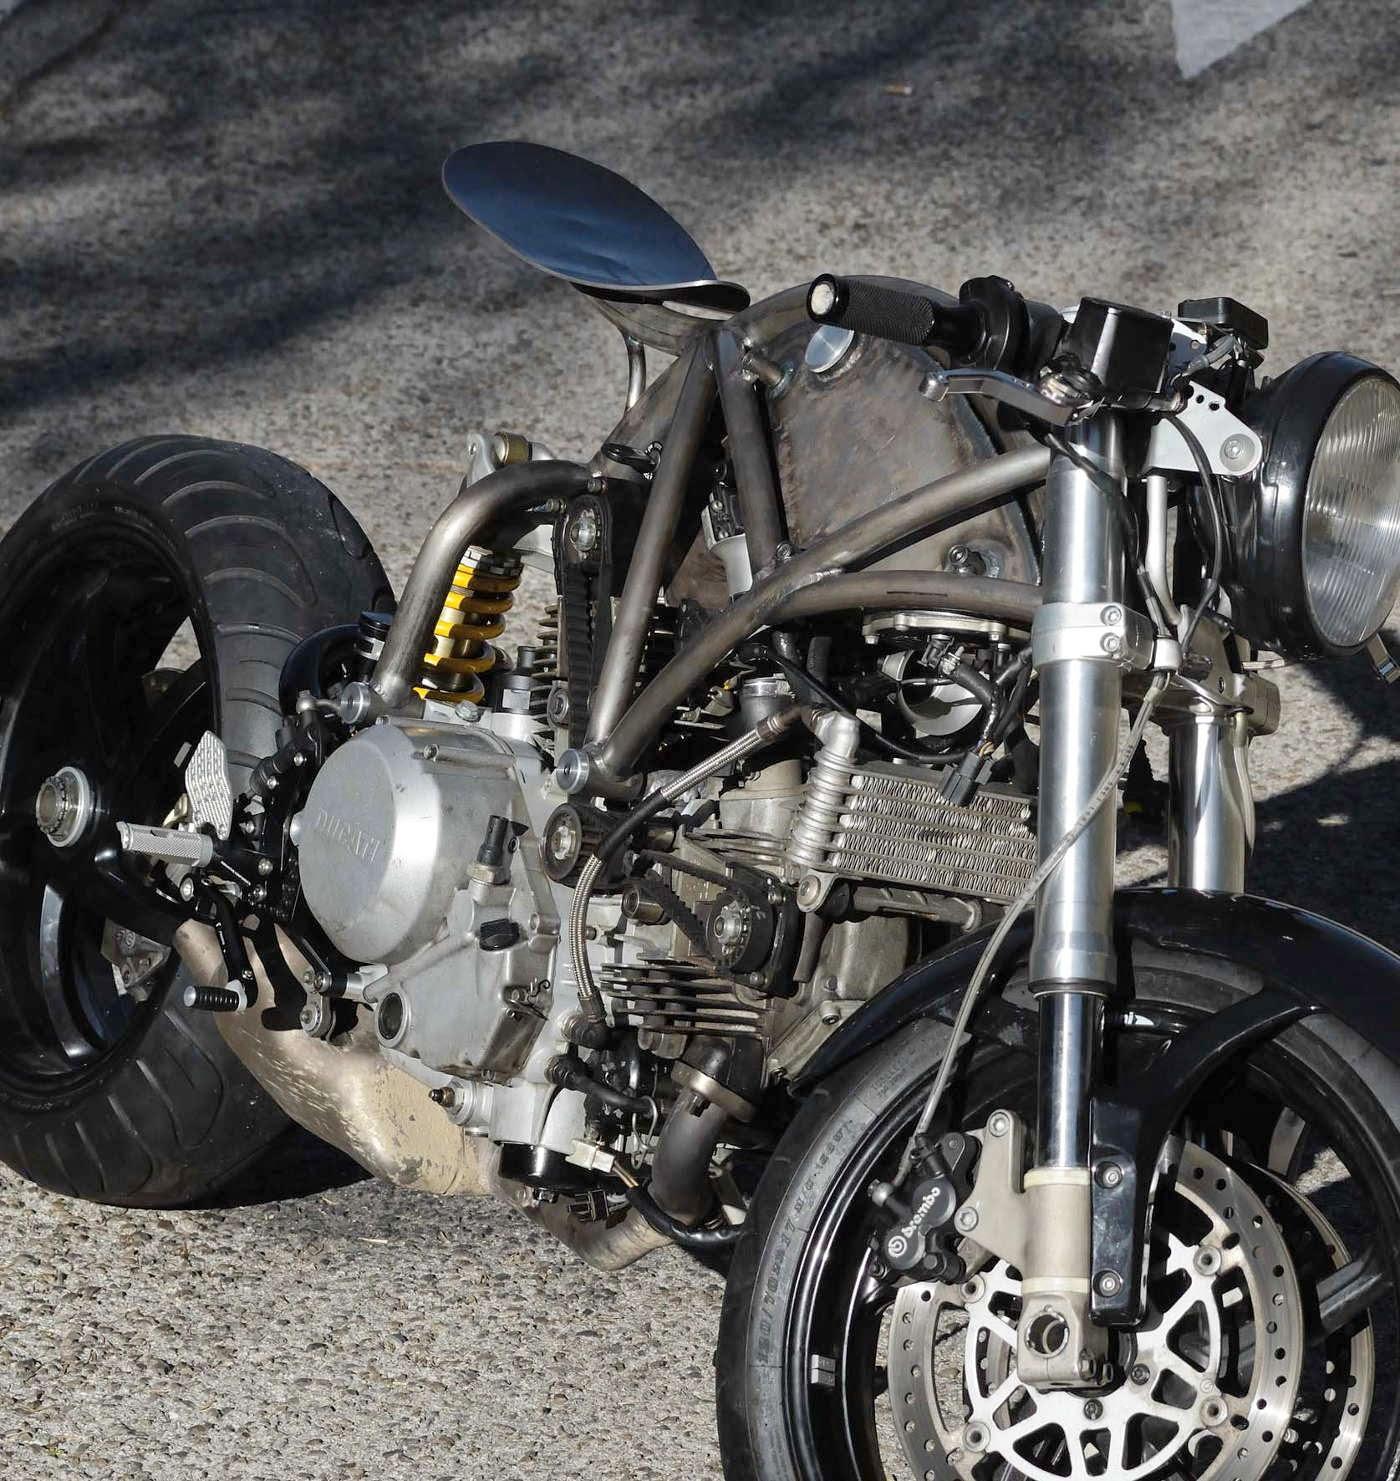 medium resolution of custom parts ducati monster custom parts ducati01pilosopiinfo 2001 yamaha r6 wiringdiagram